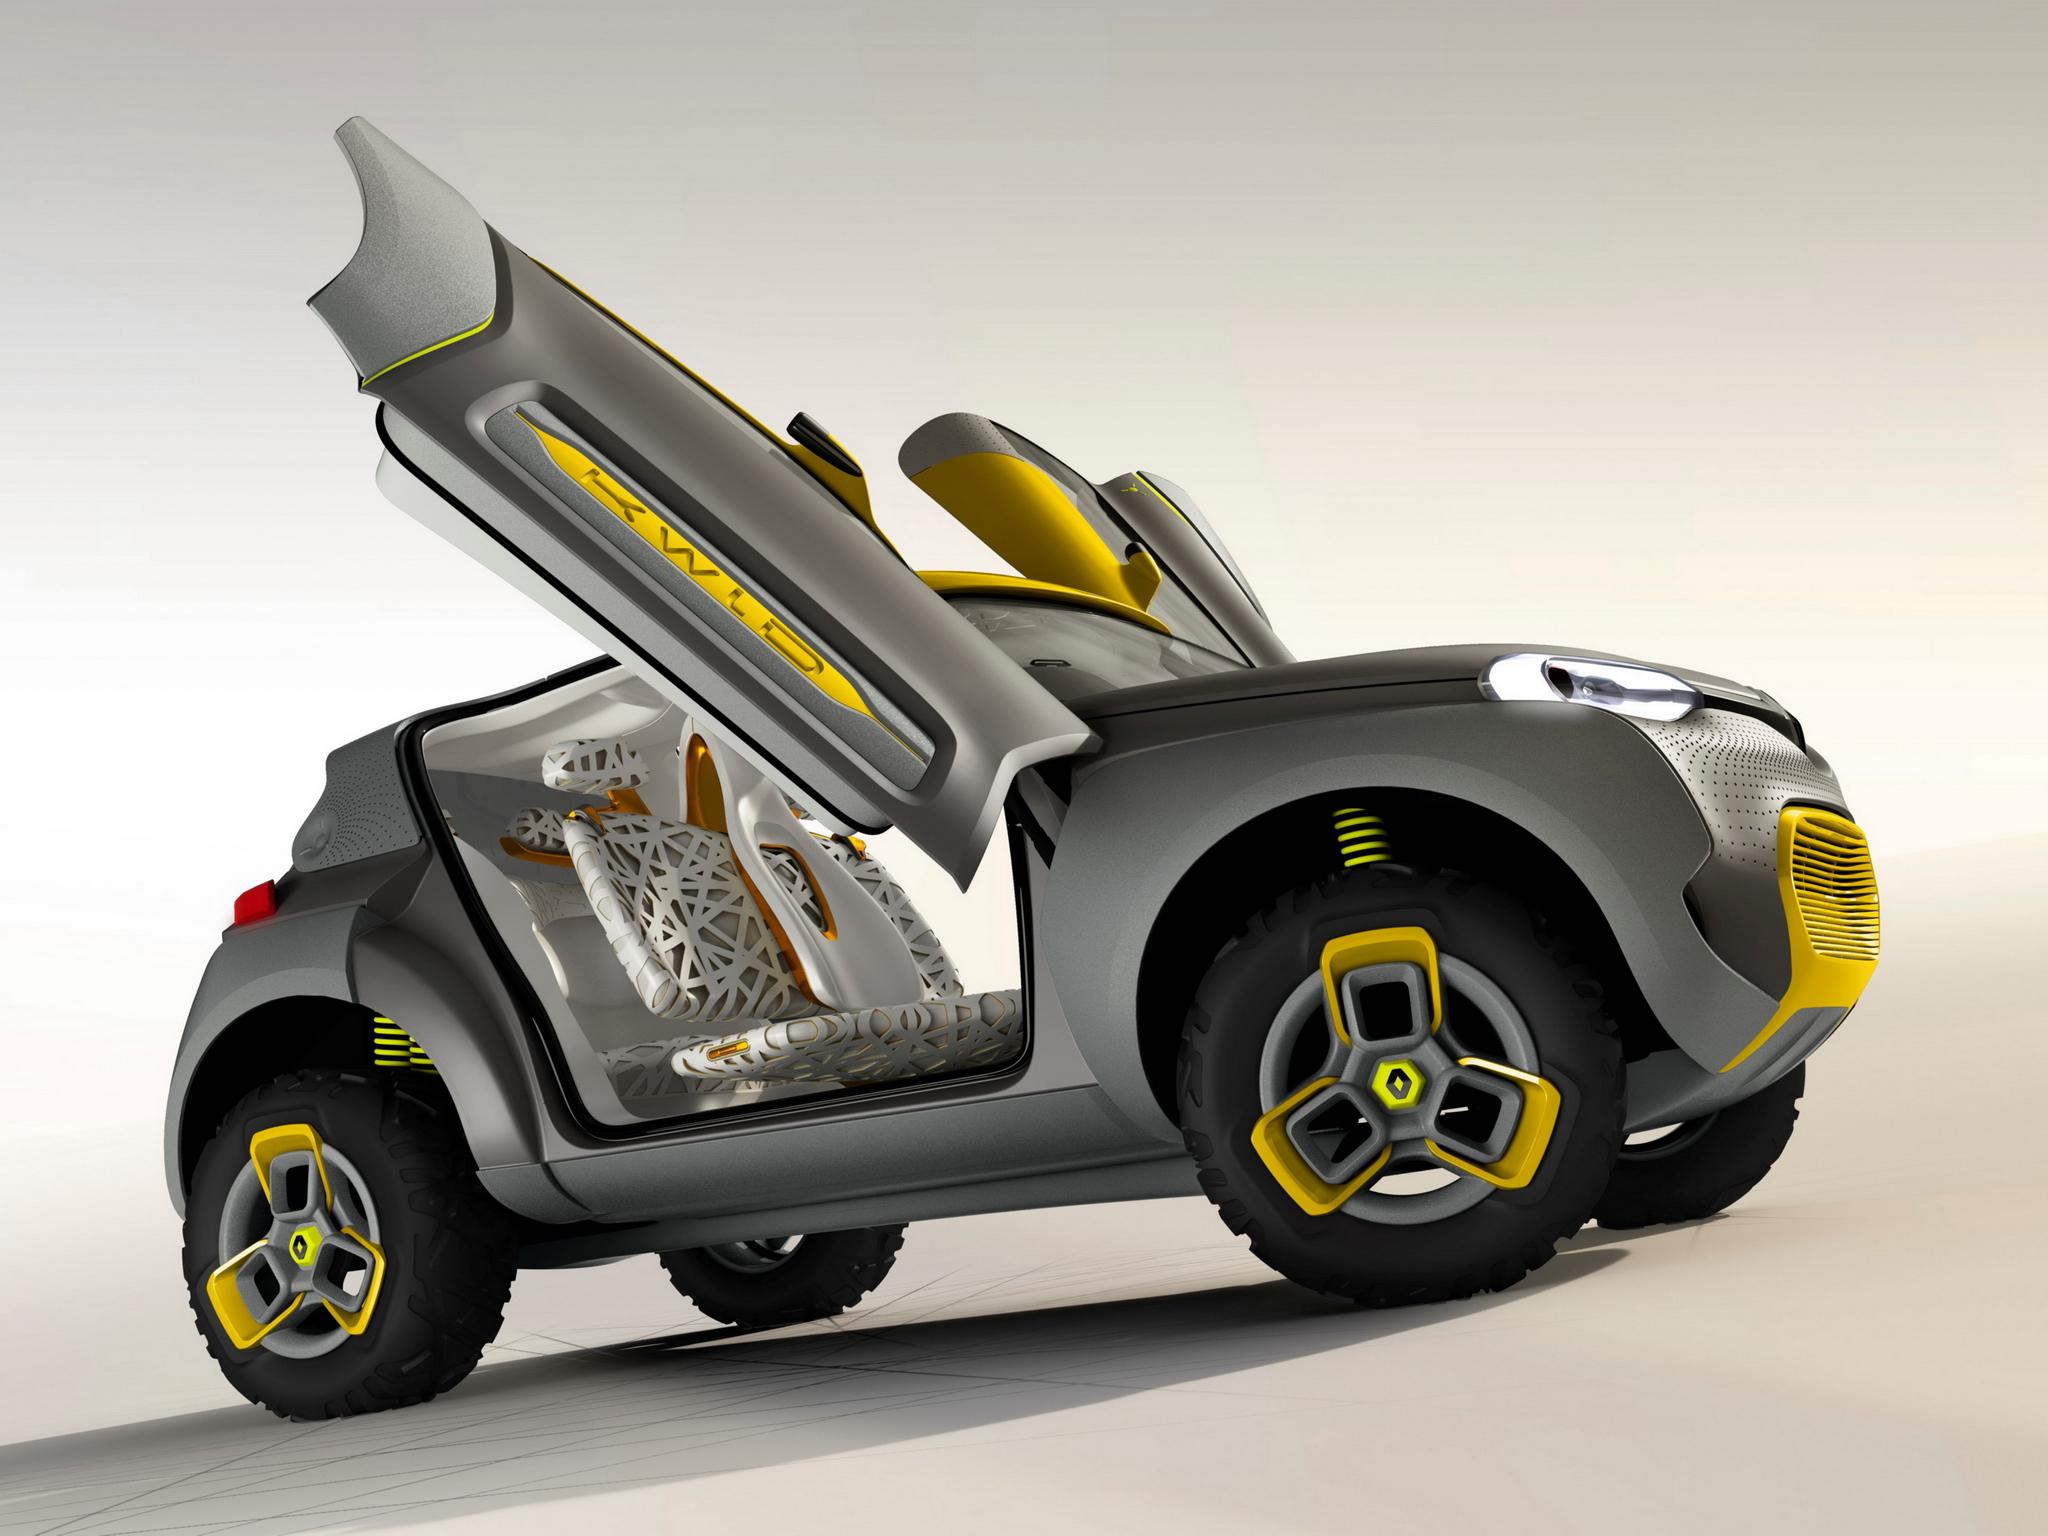 Renault Kwid concept 2014 - portes ouvertes / open doors